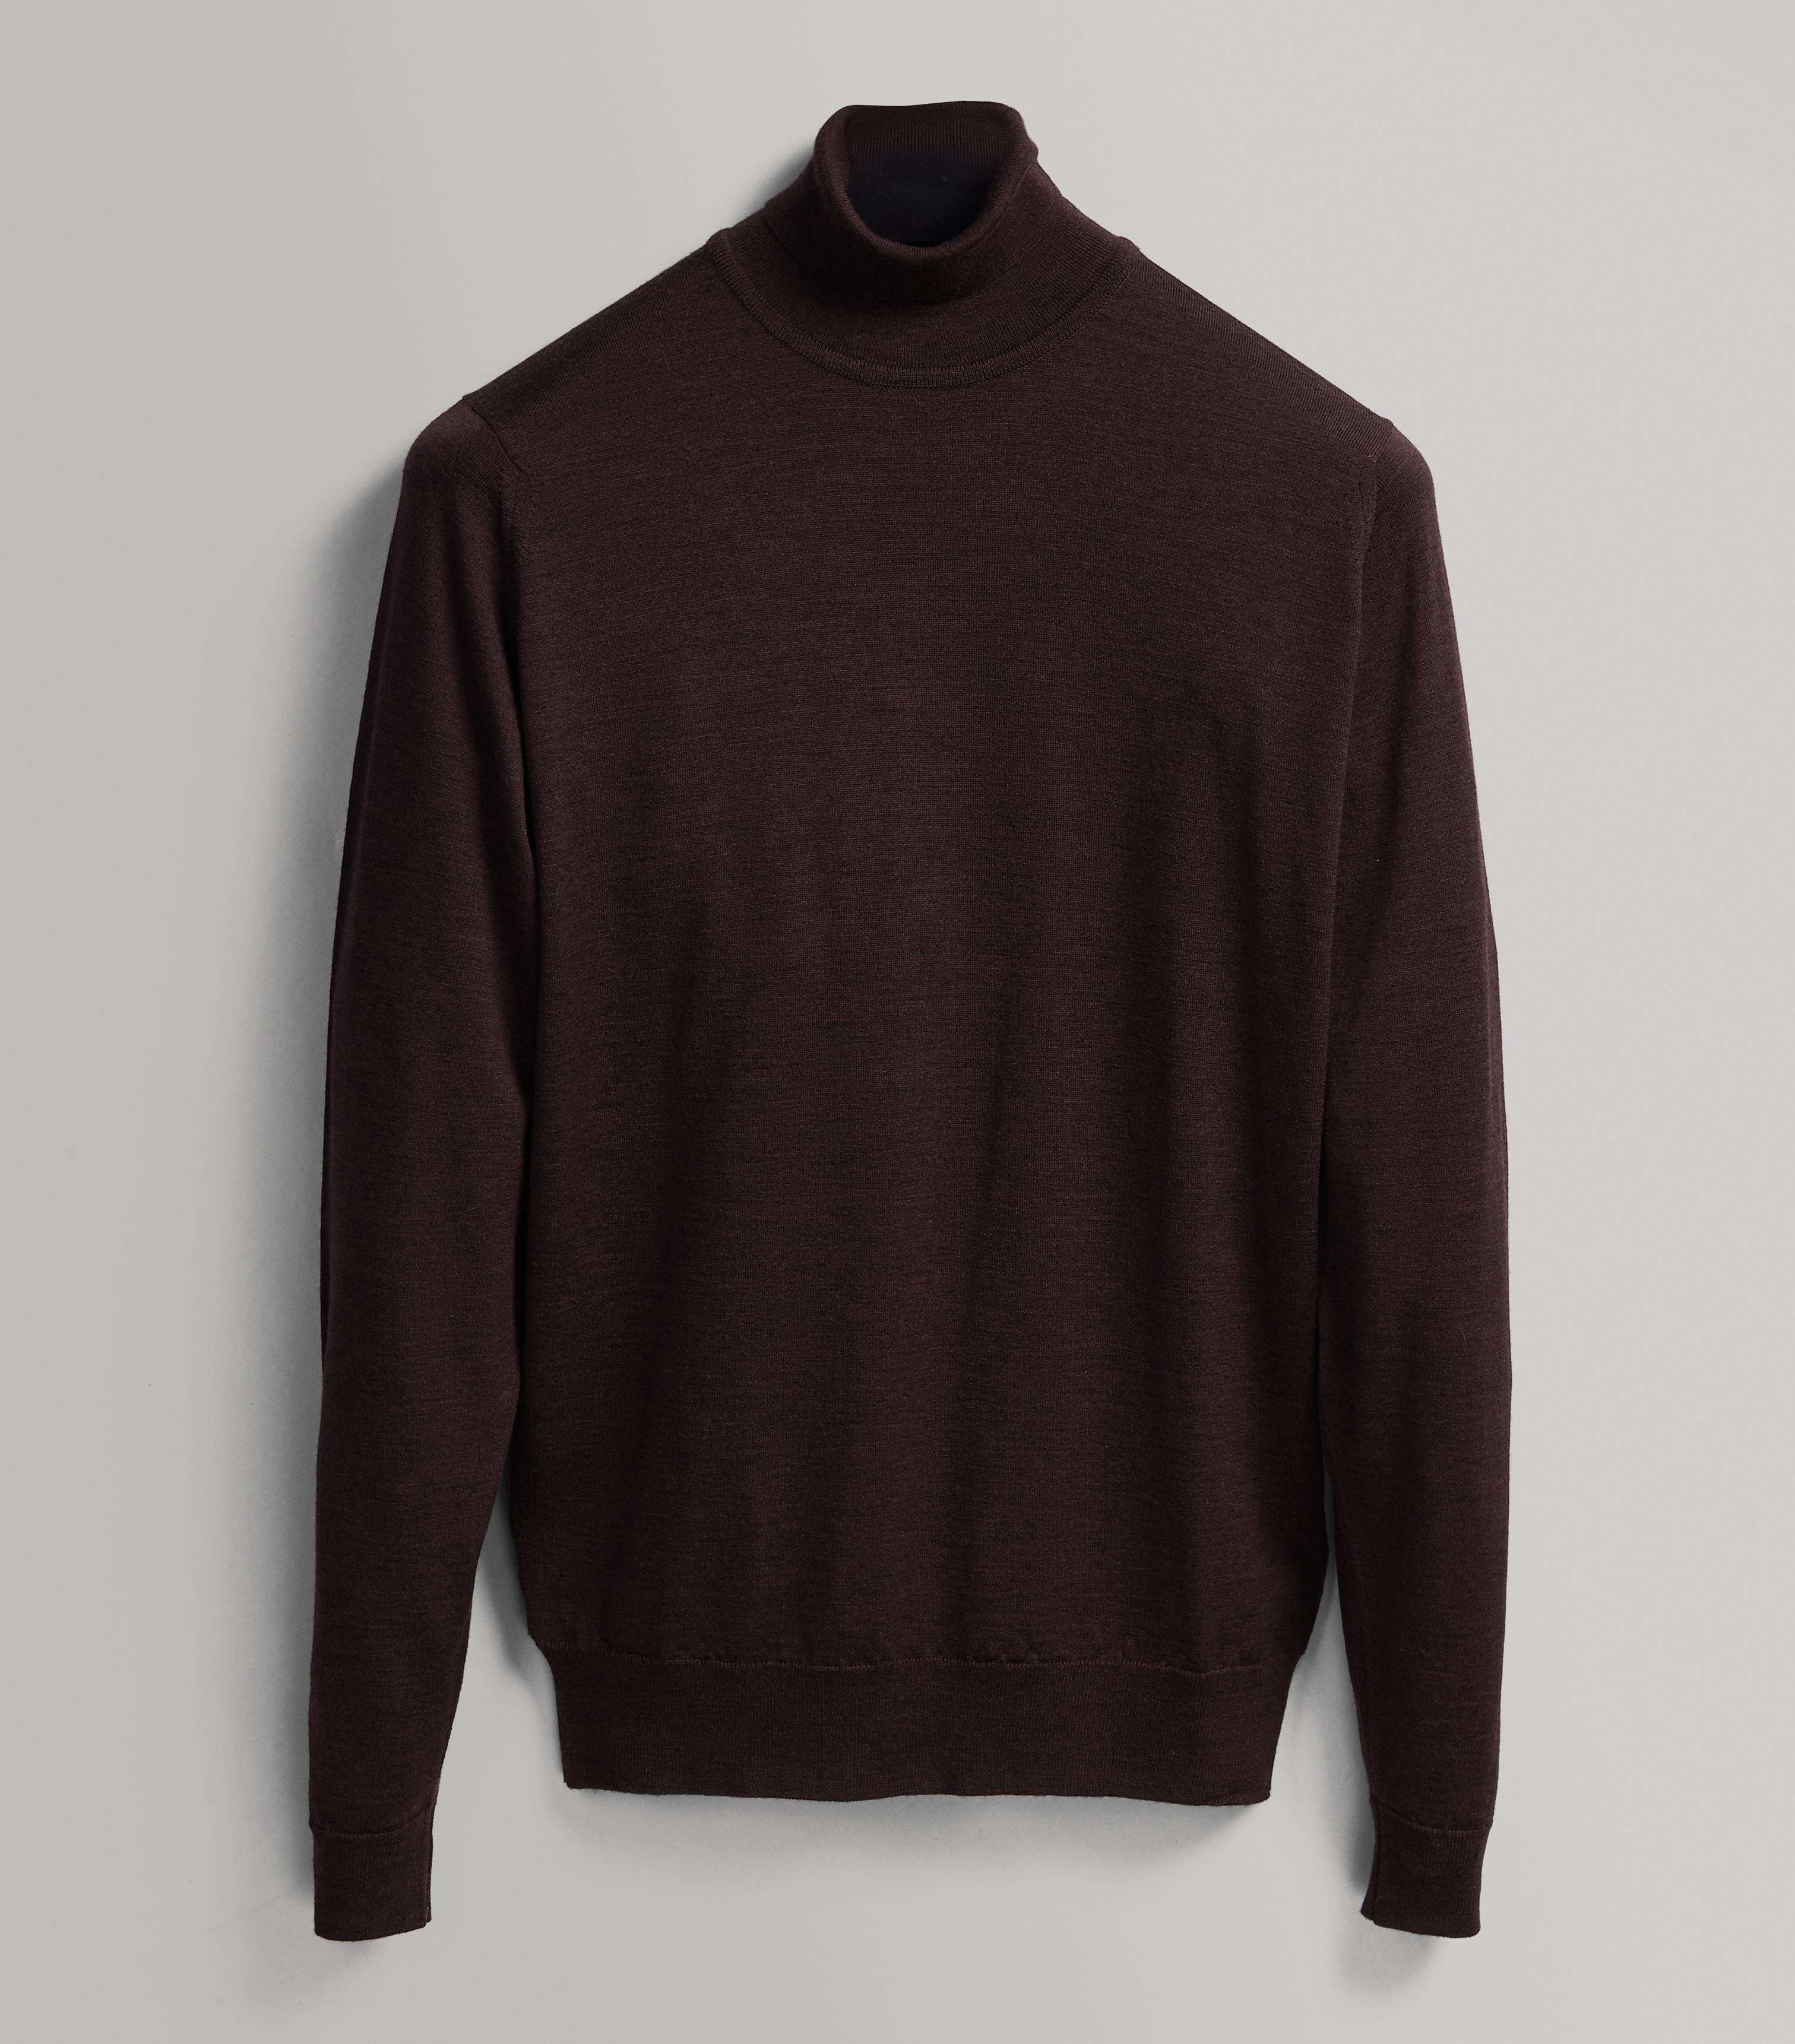 Huntsman Rollneck Pullover- Knitwear, Jumper